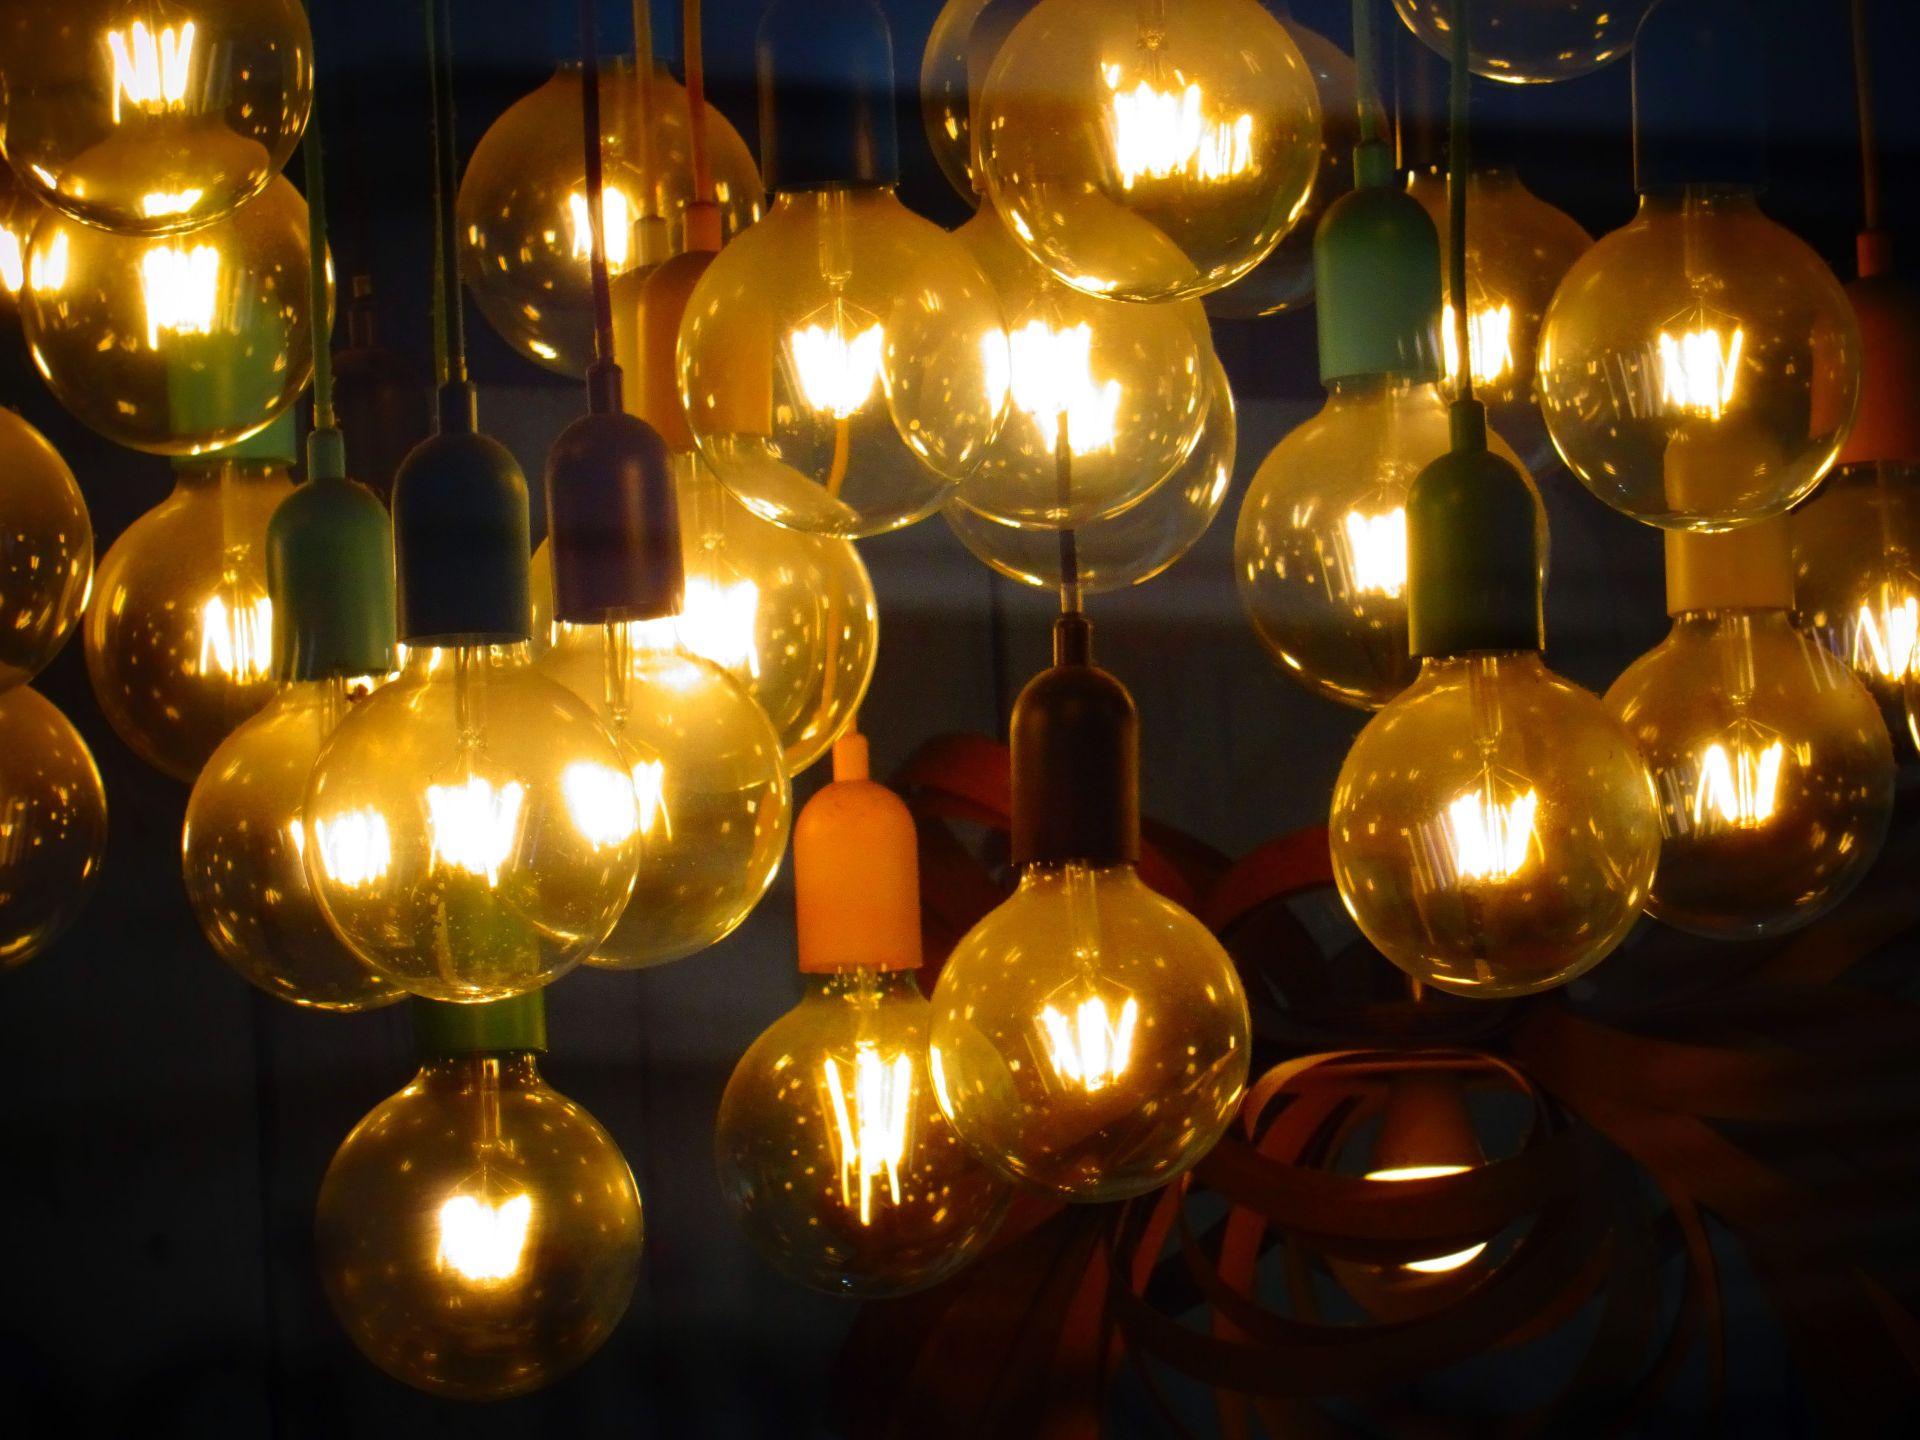 blur-bulbs-close-up-400990